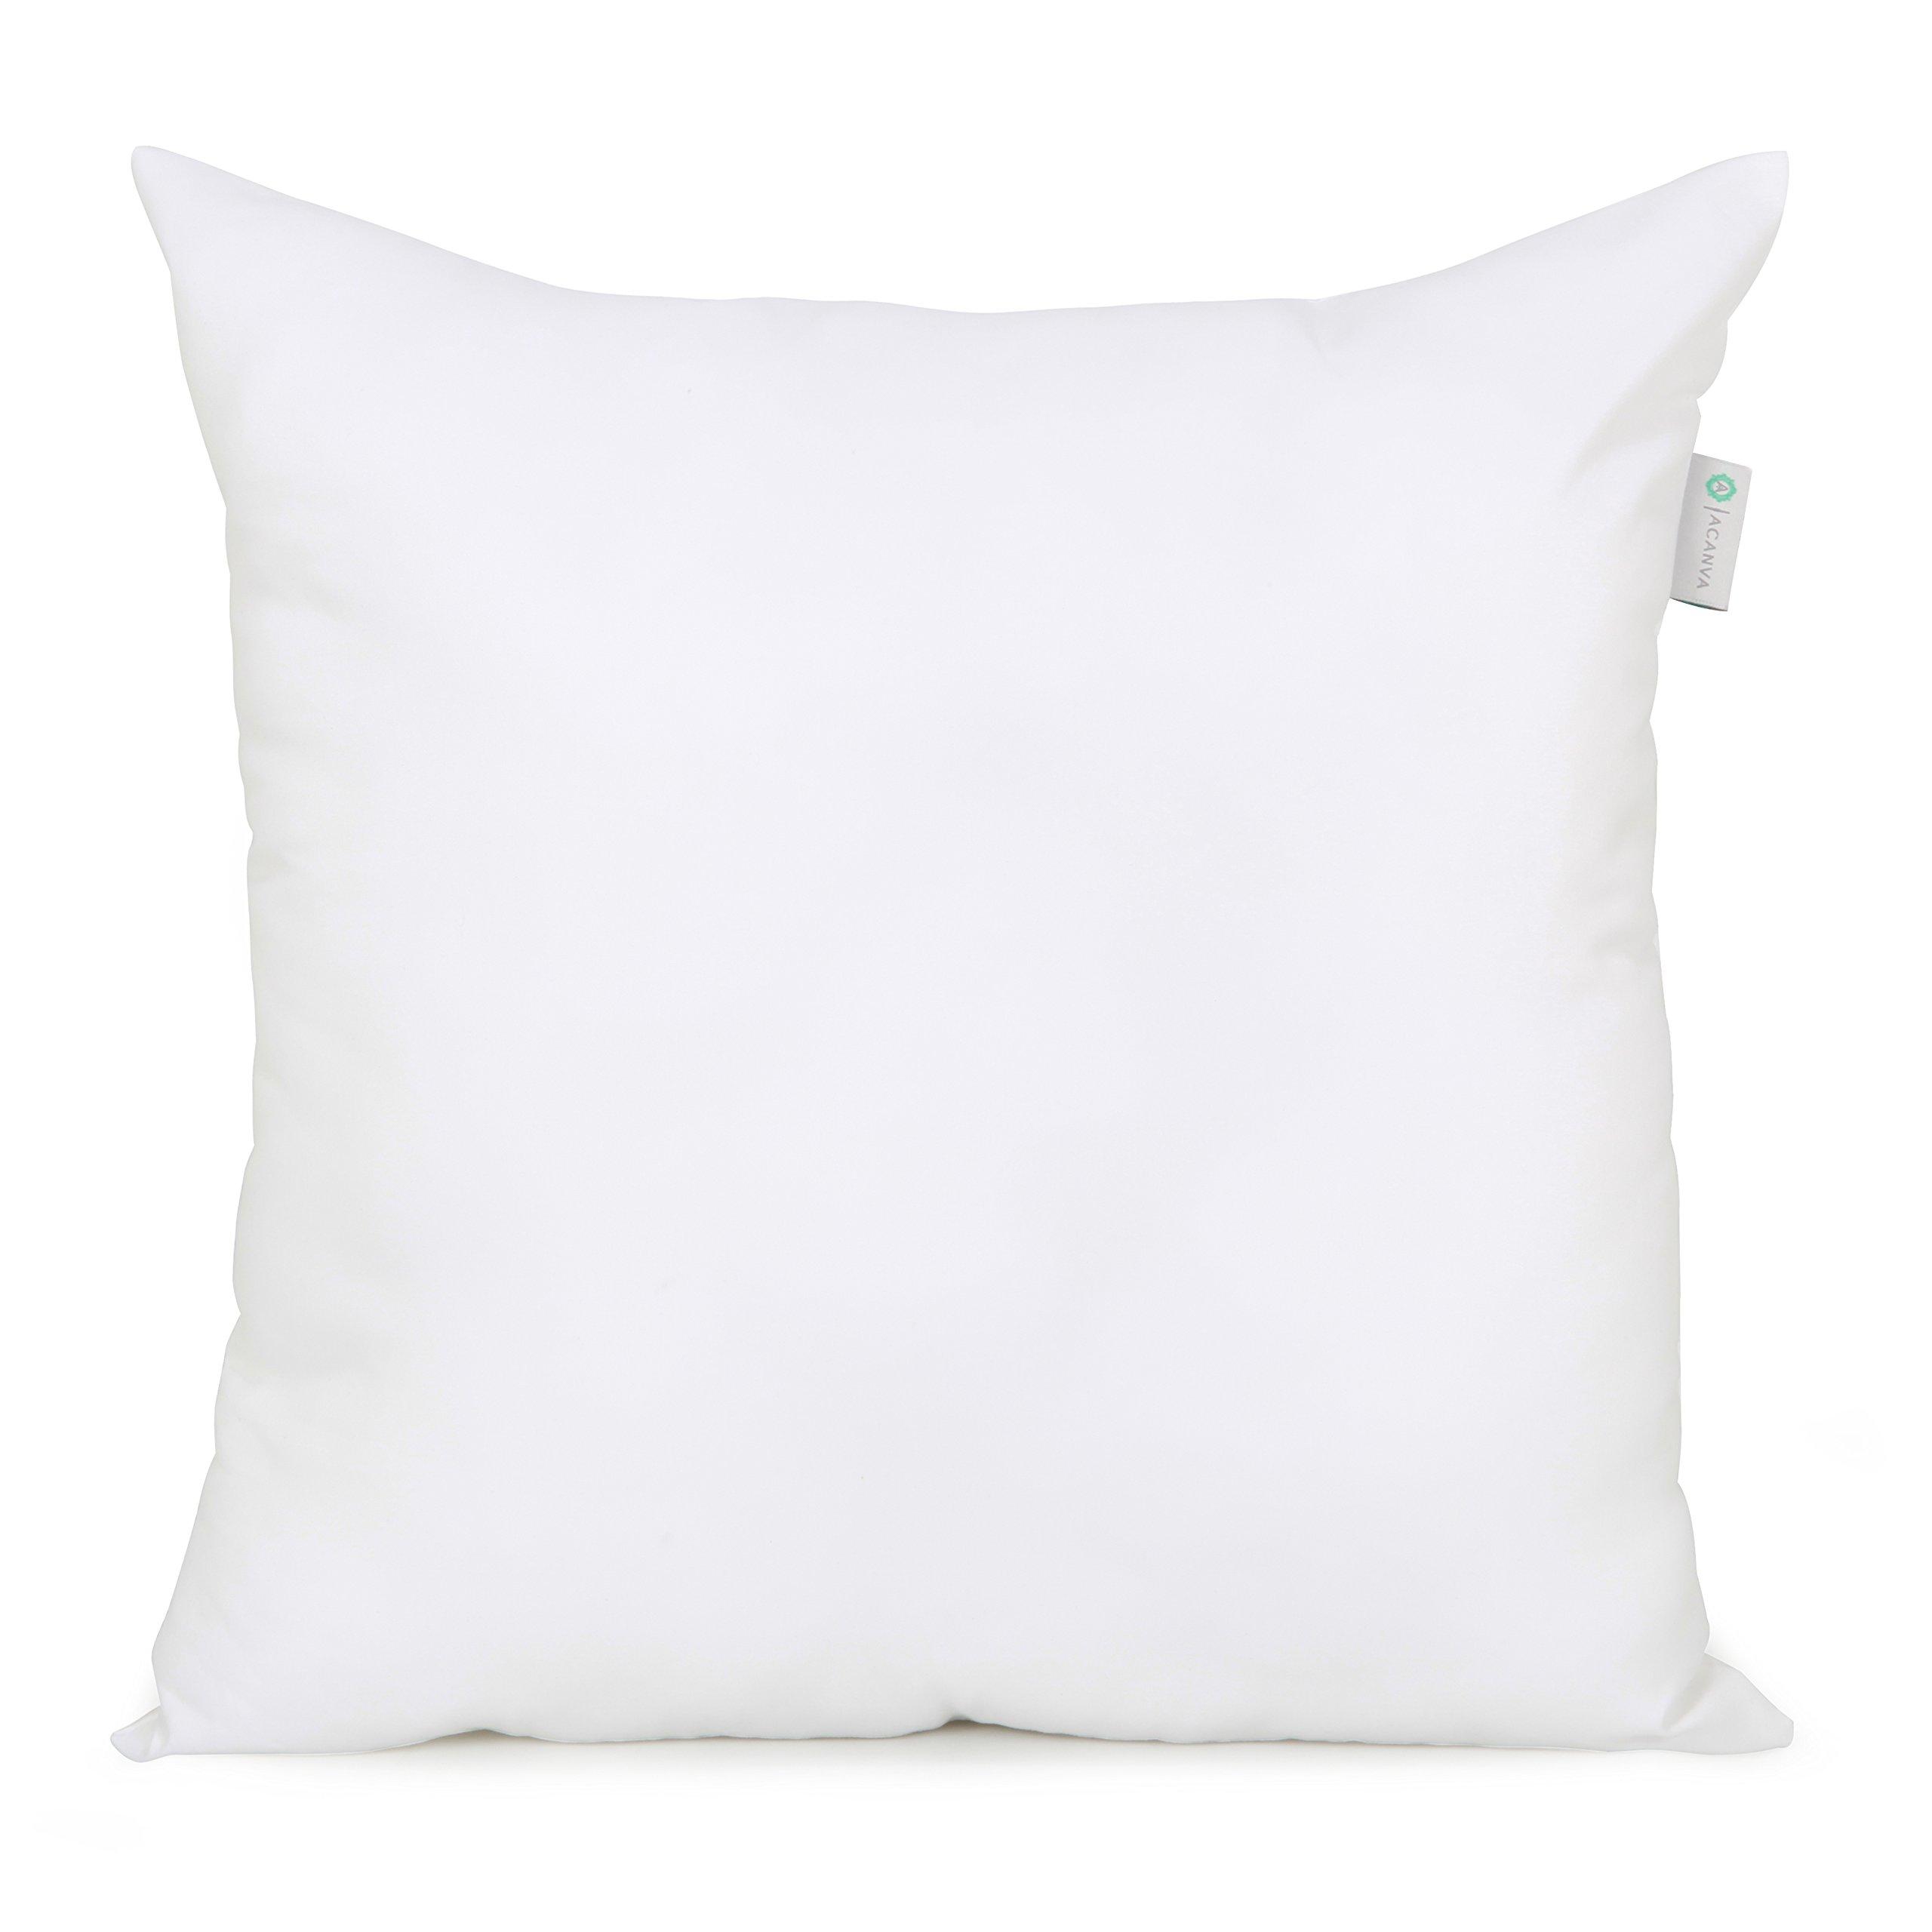 Acanva Down Alternative Pillow Insert Sham Form, Square, 24'' L x 24'' W